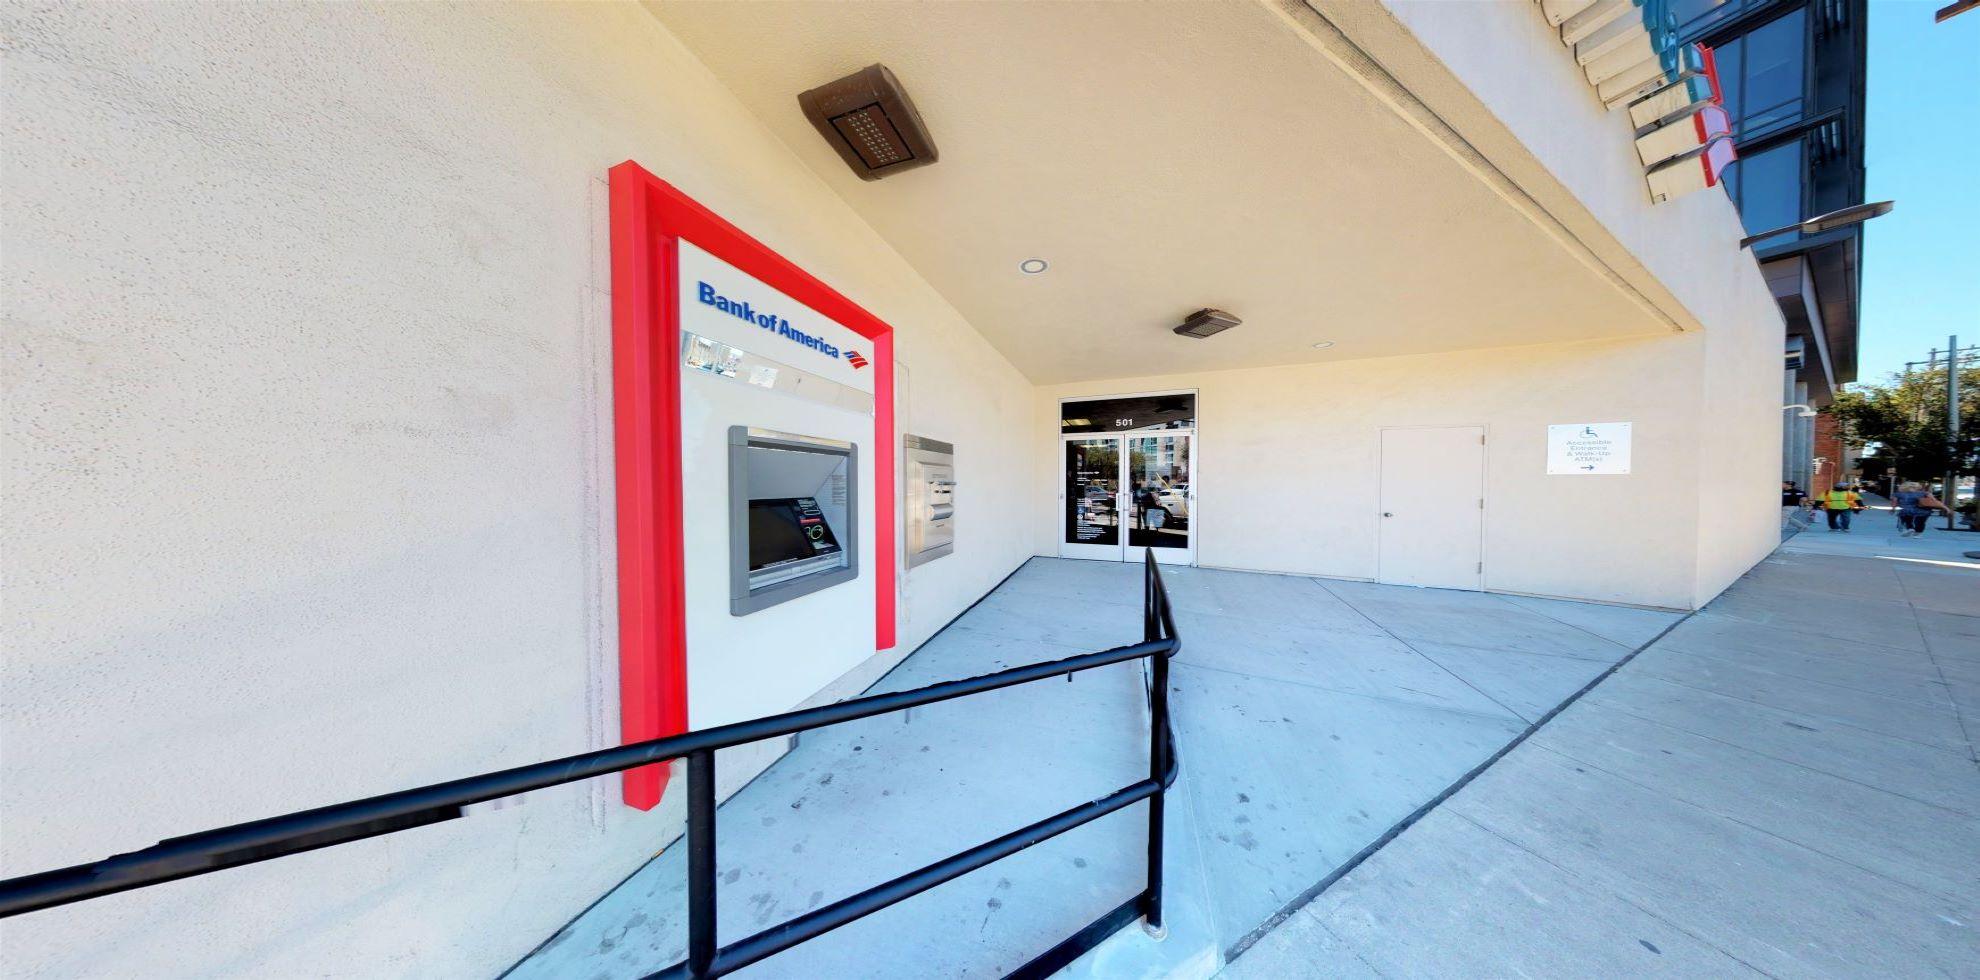 Bank of America financial center with drive-thru ATM | 501 Brannan St, San Francisco, CA 94107